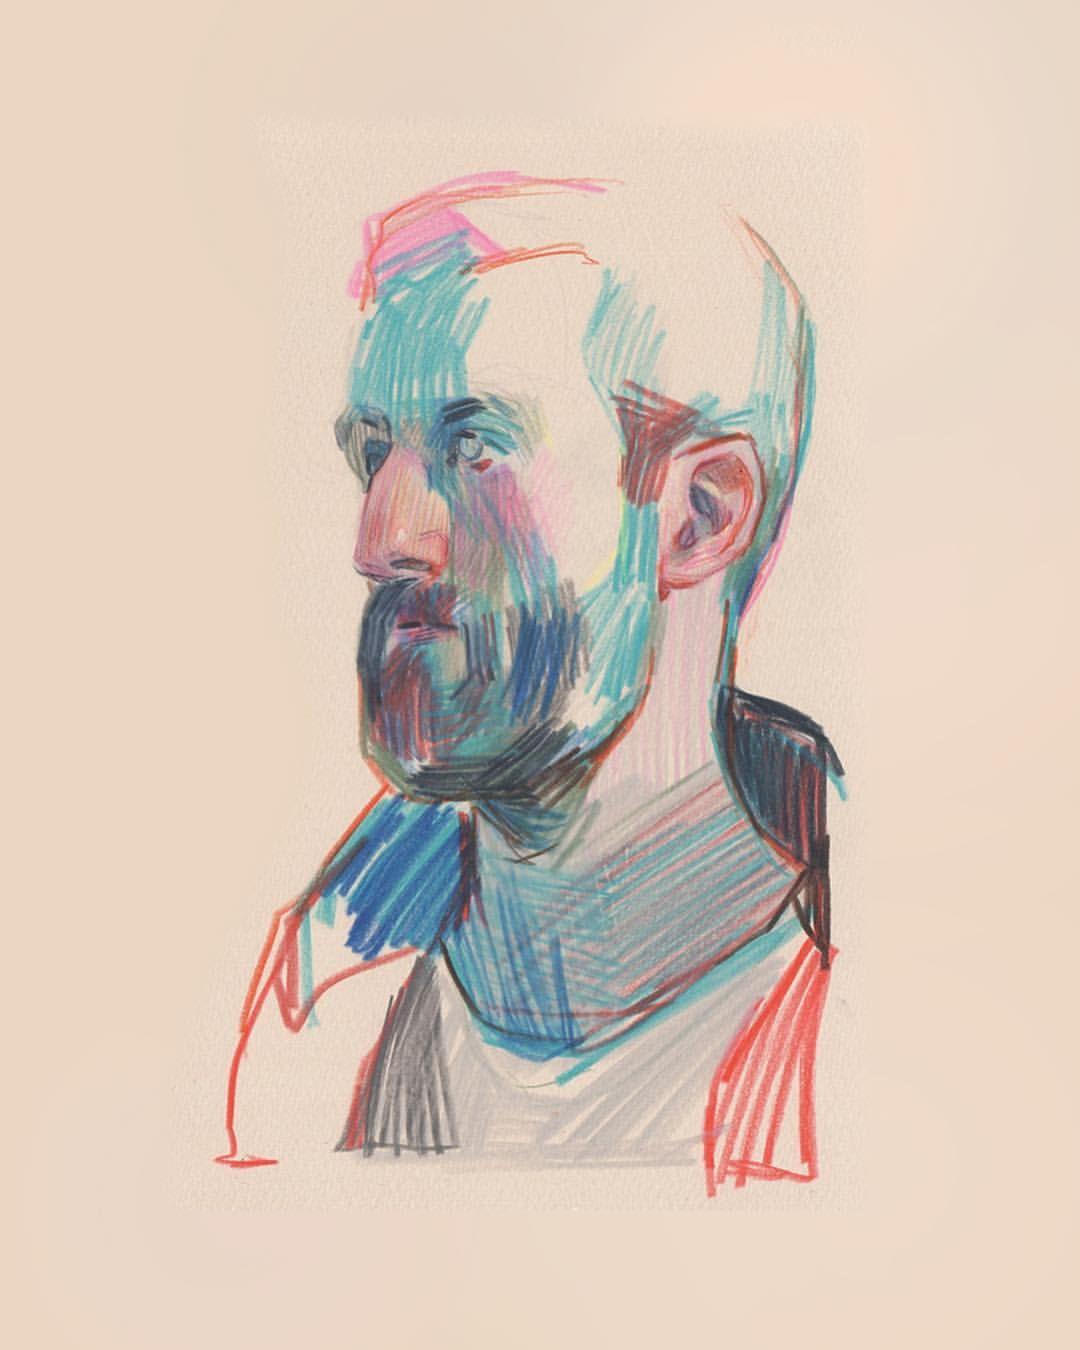 Color pencil drawings color pencil sketch colored pencil portrait drawing sketches art